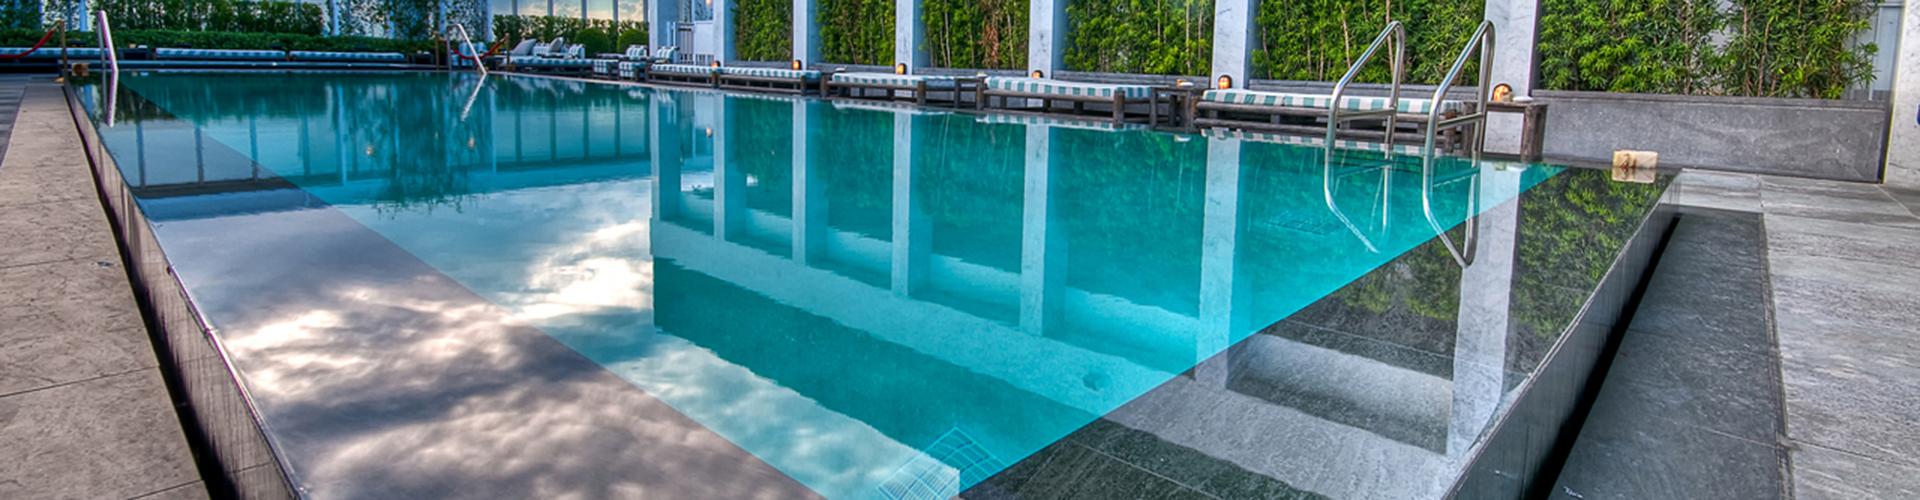 Construction piscine mirroir centerspas for Construction piscine geneve